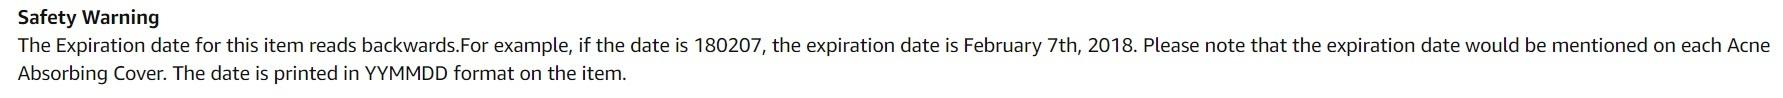 nexcare_acne _patch_expiration_date